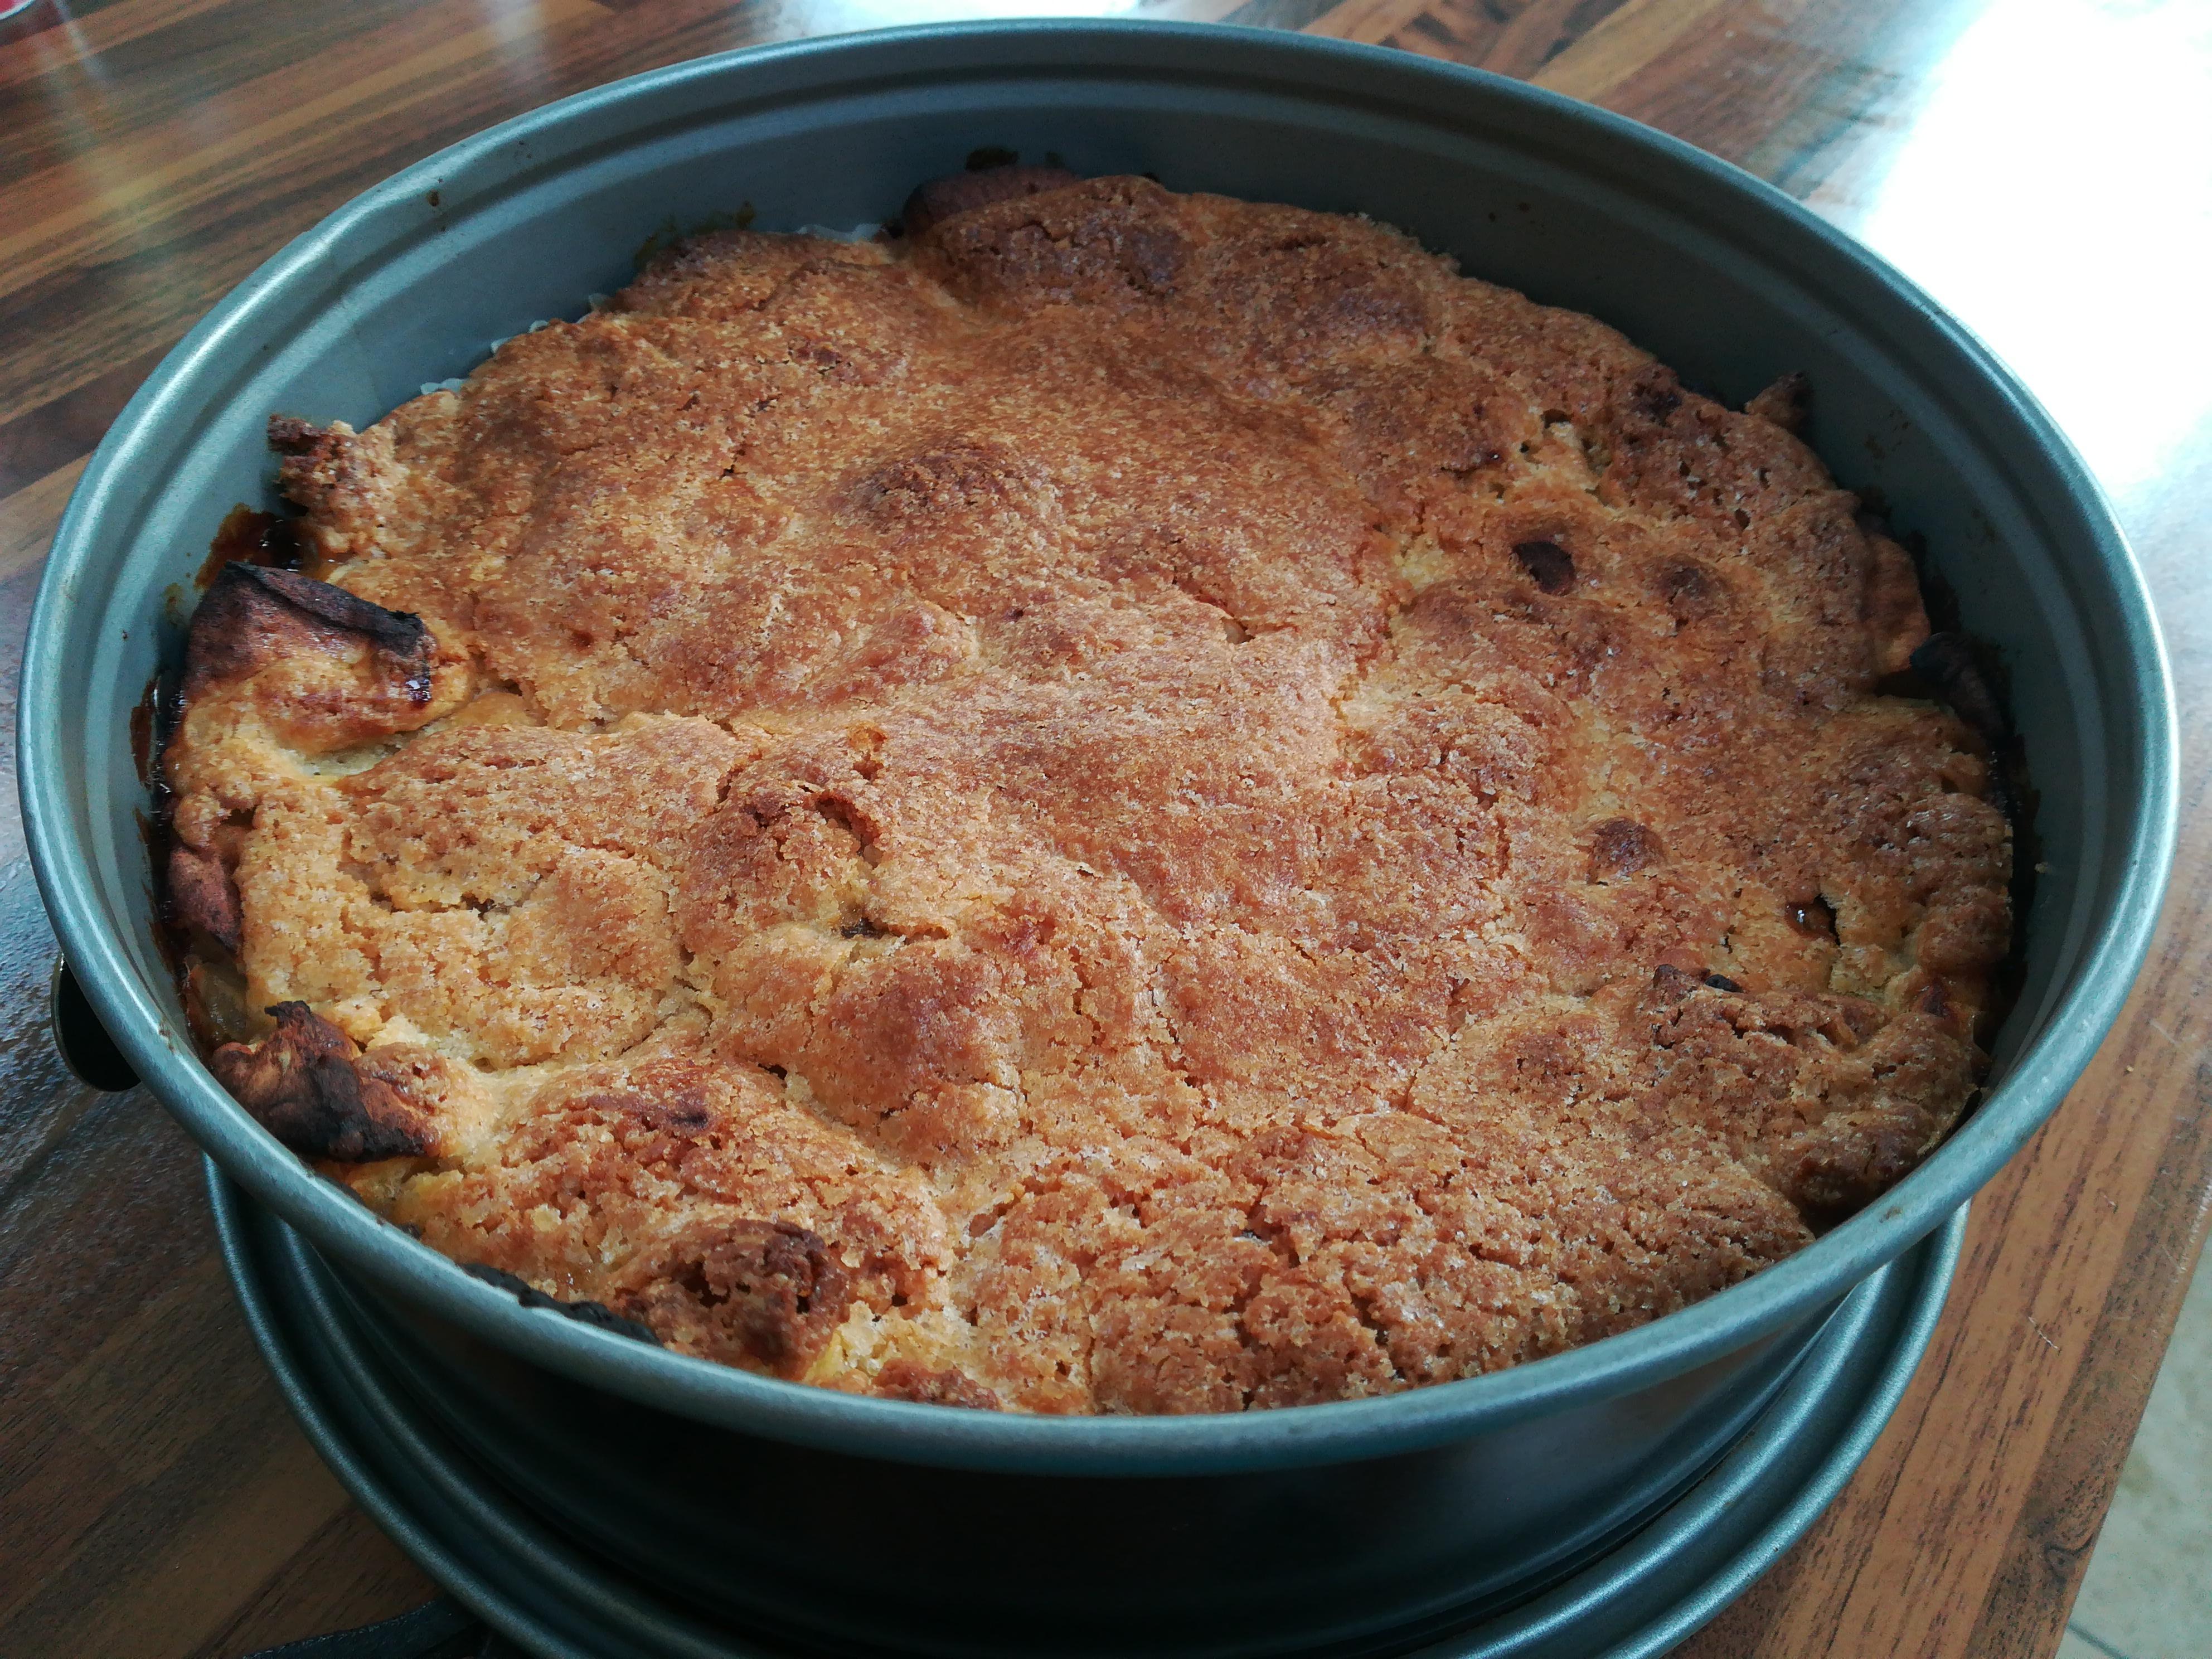 Easy Swedish Apple Pie Maeve Kelly